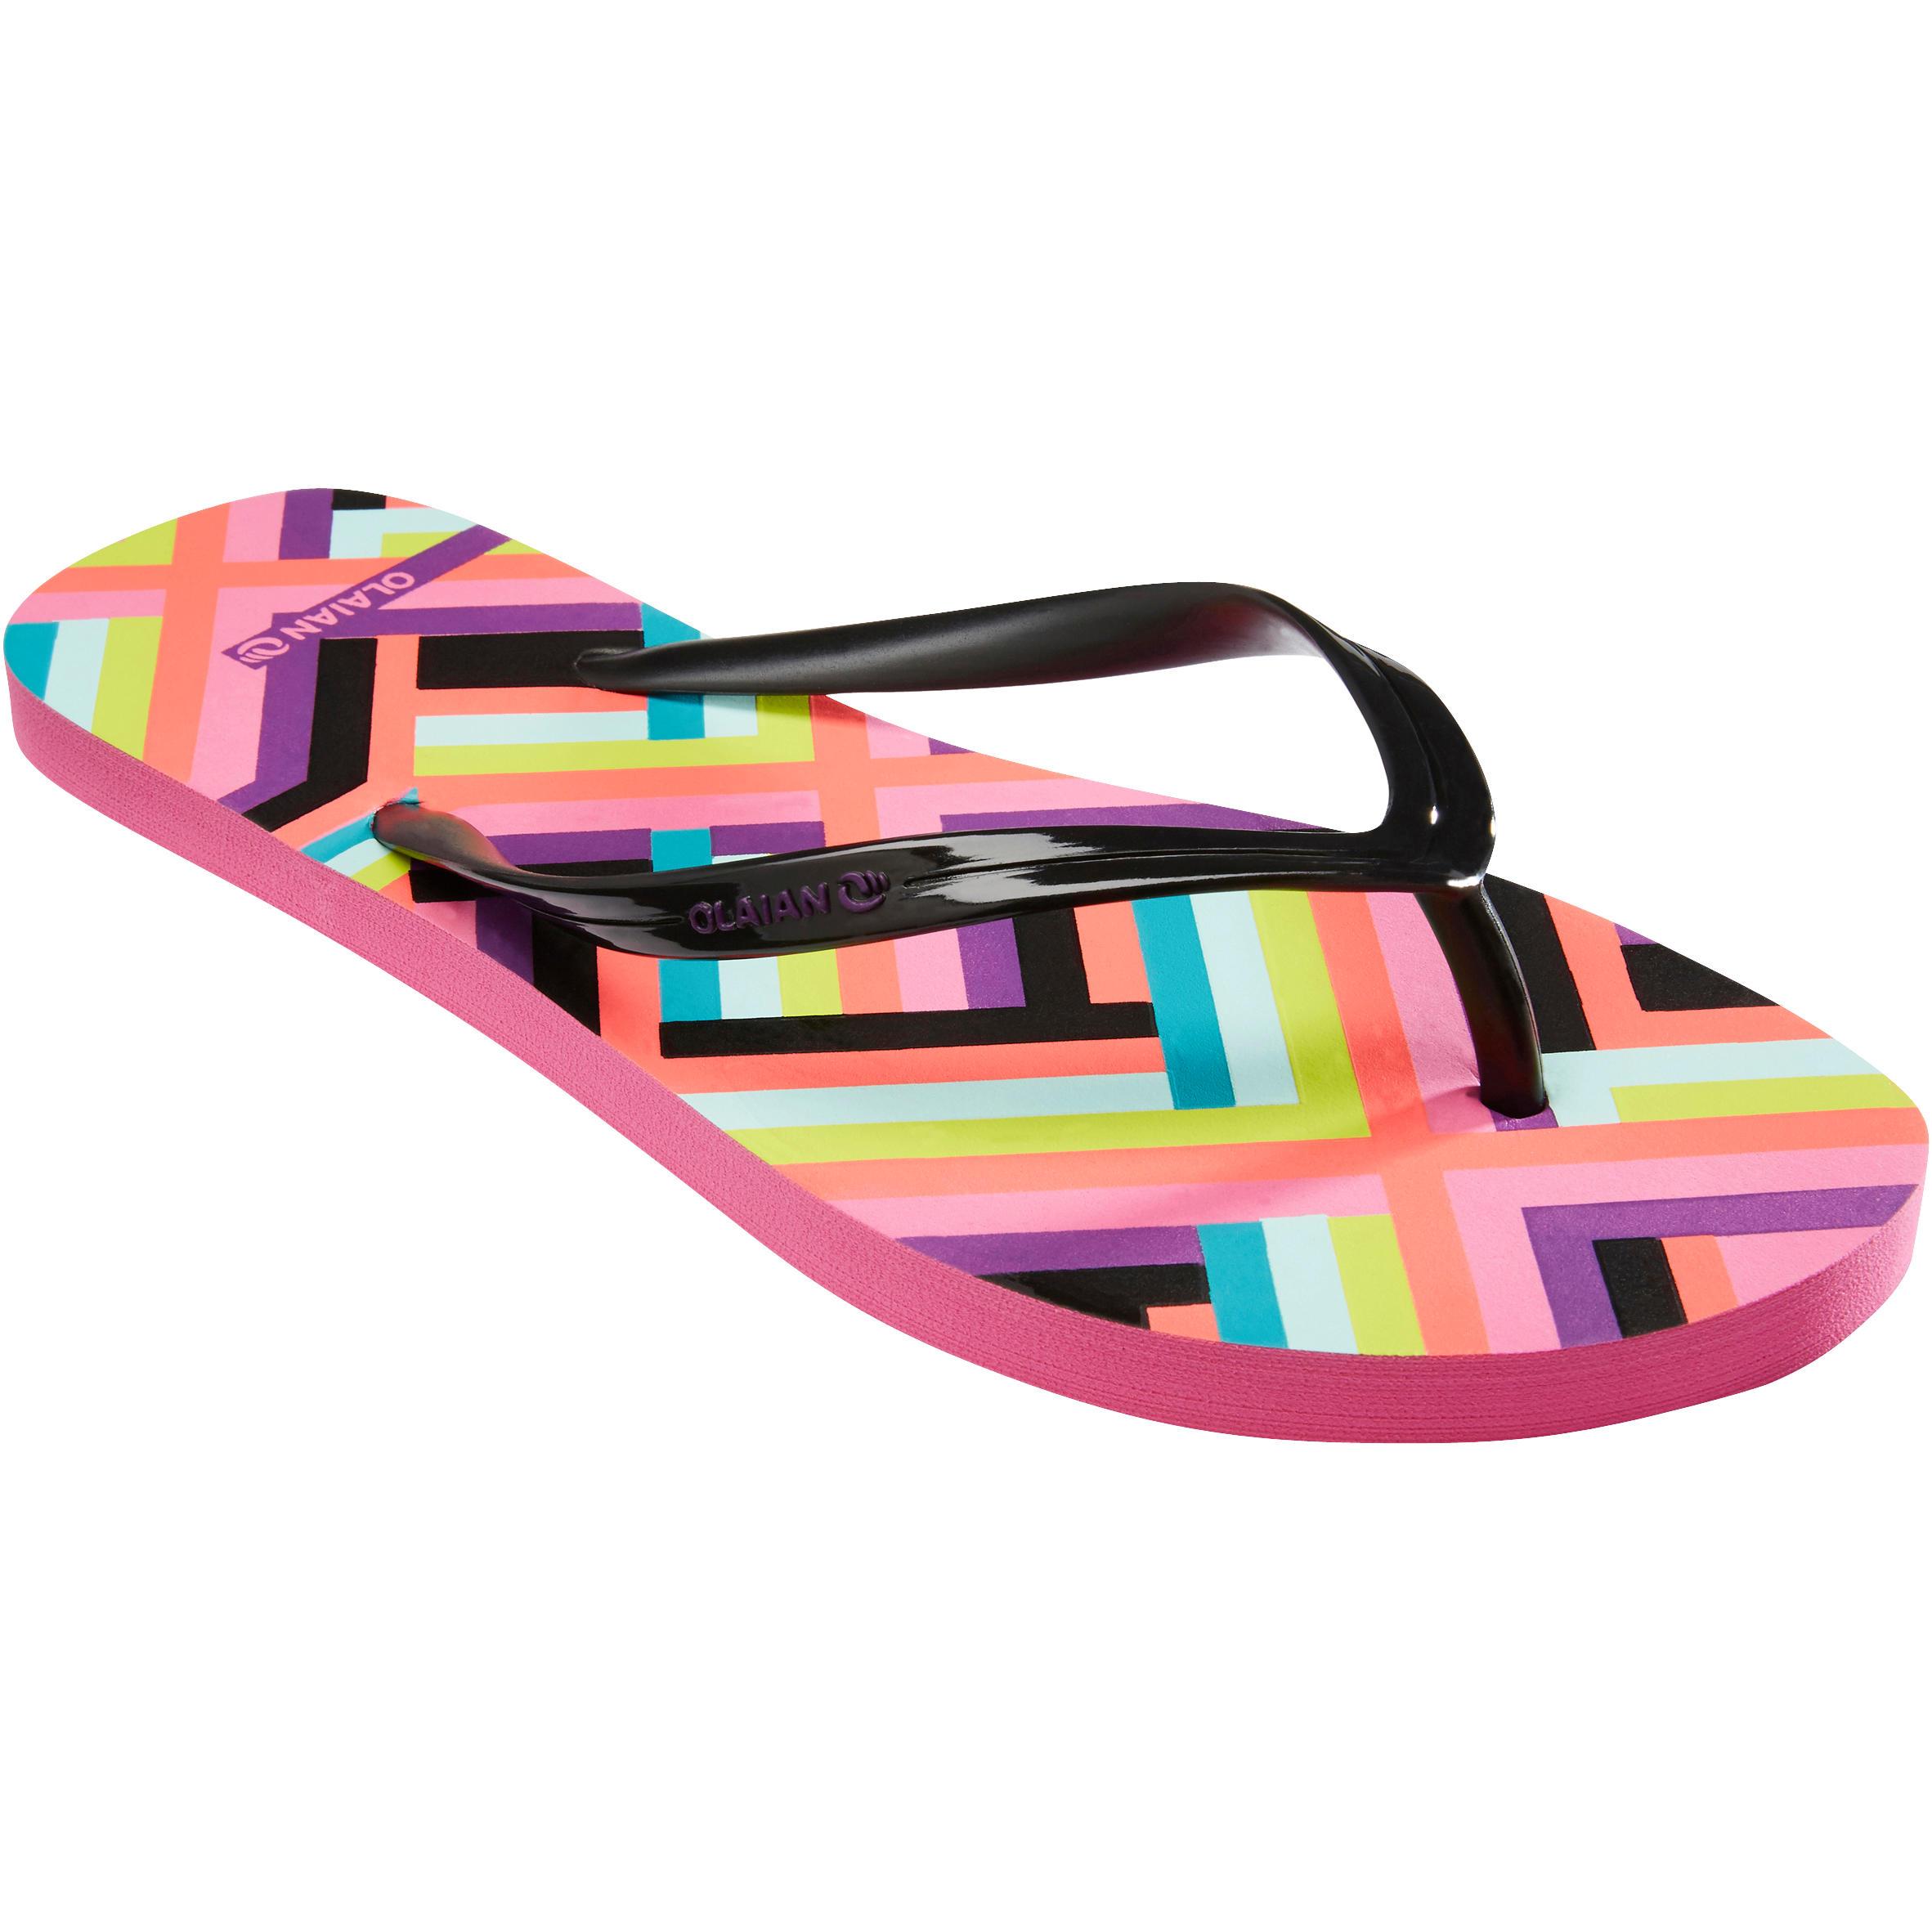 TO 150 W Pop Women's Flip-Flops